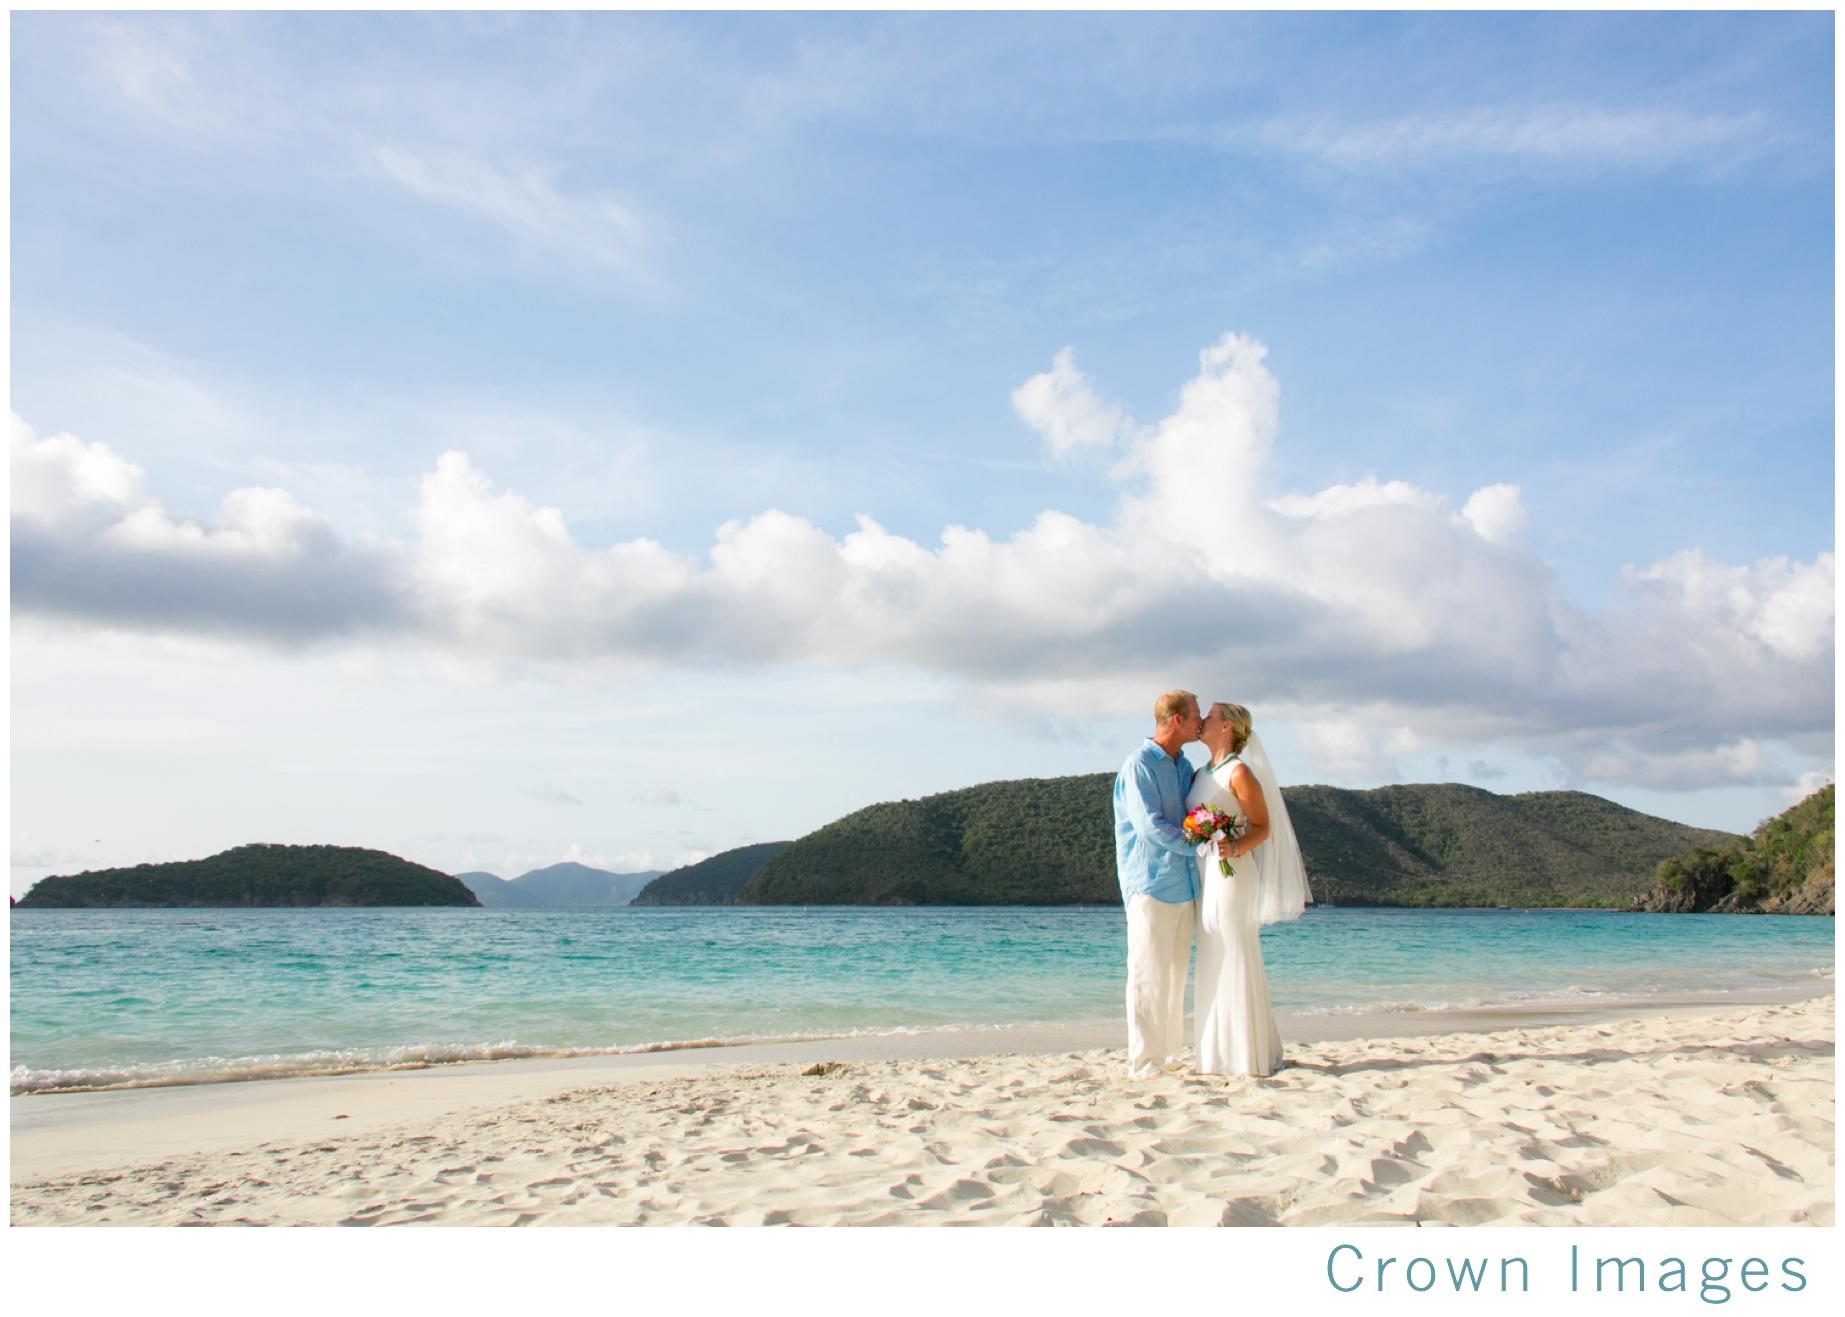 st_john_wedding_photographer_crown_images_0073.jpg